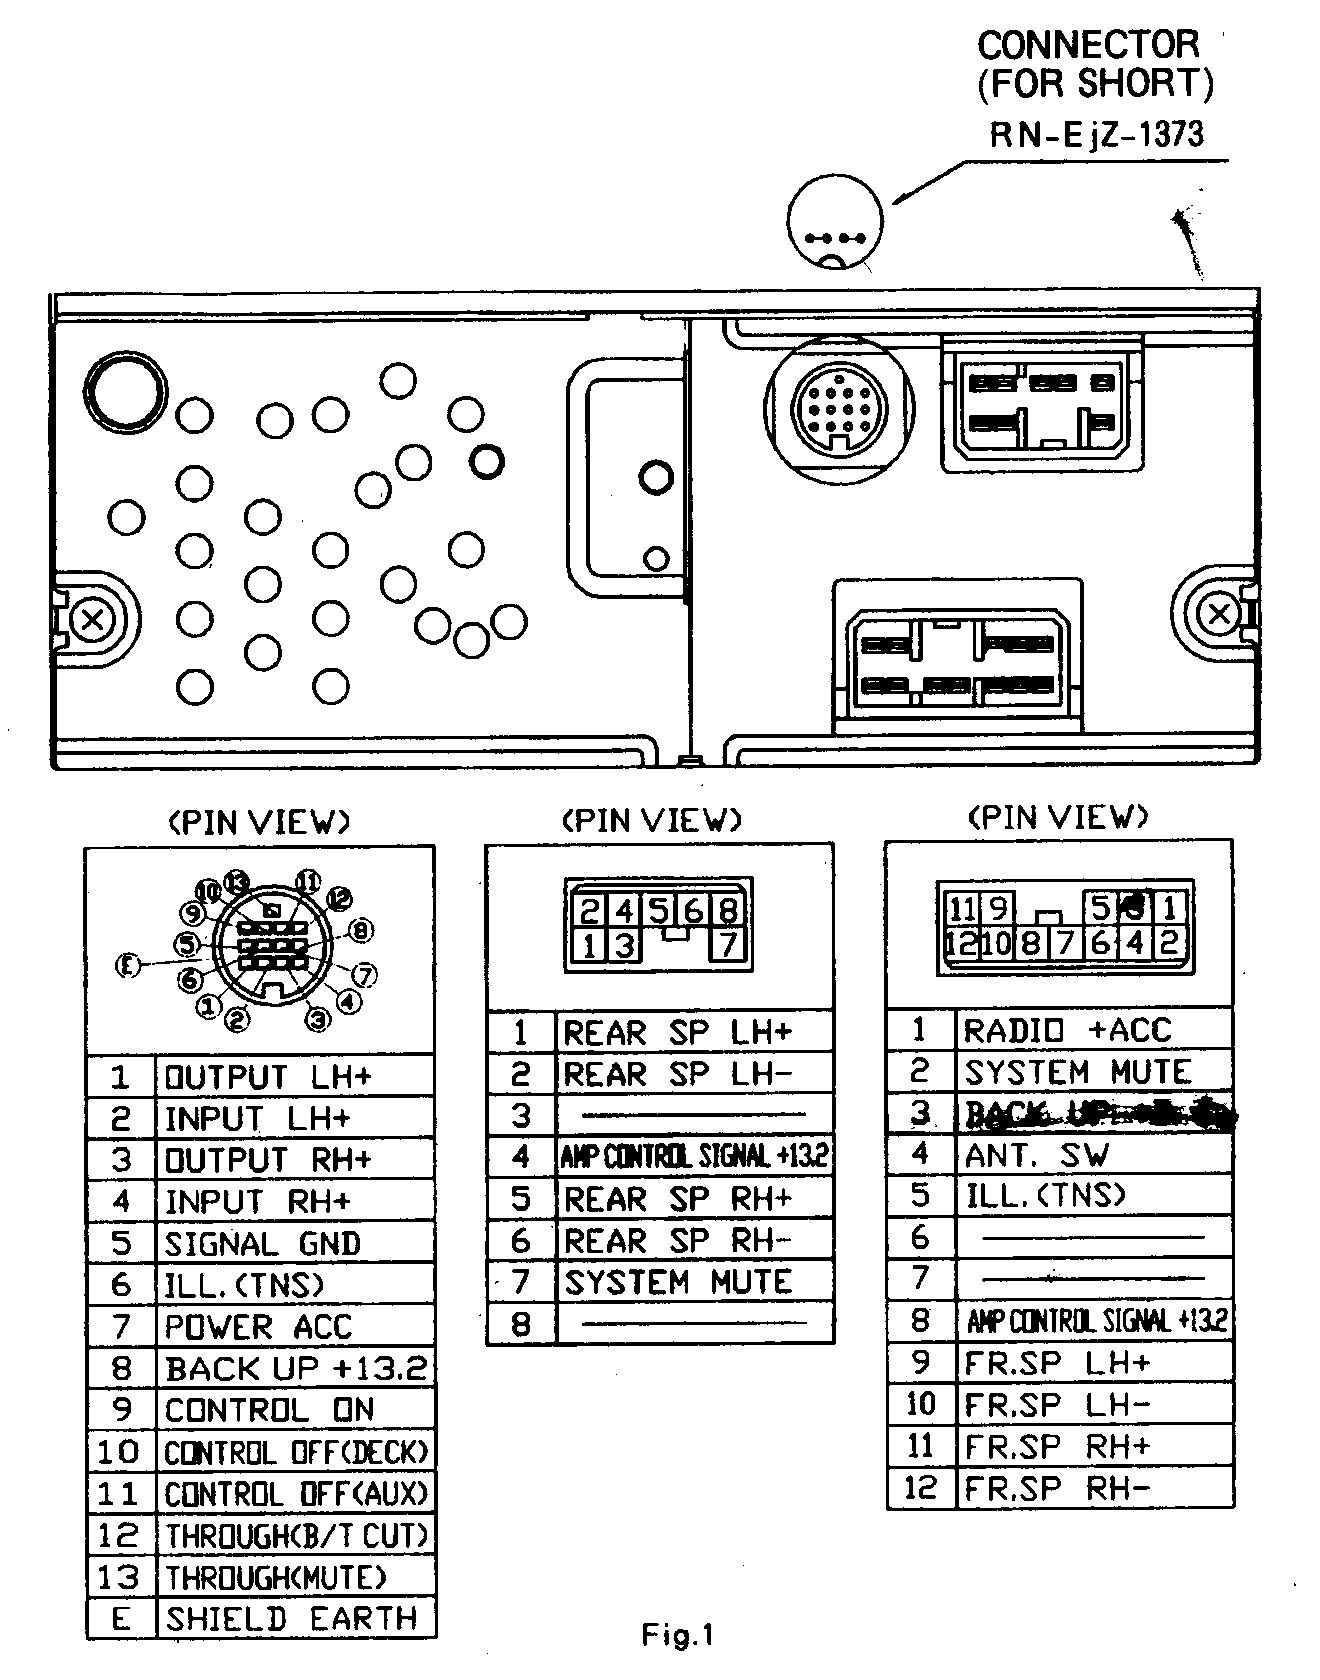 5915A5 New 2000 Mazda Protege Radio Wiring Diagram   Wiring Diagram ...    Wiring LibraryWiring Library